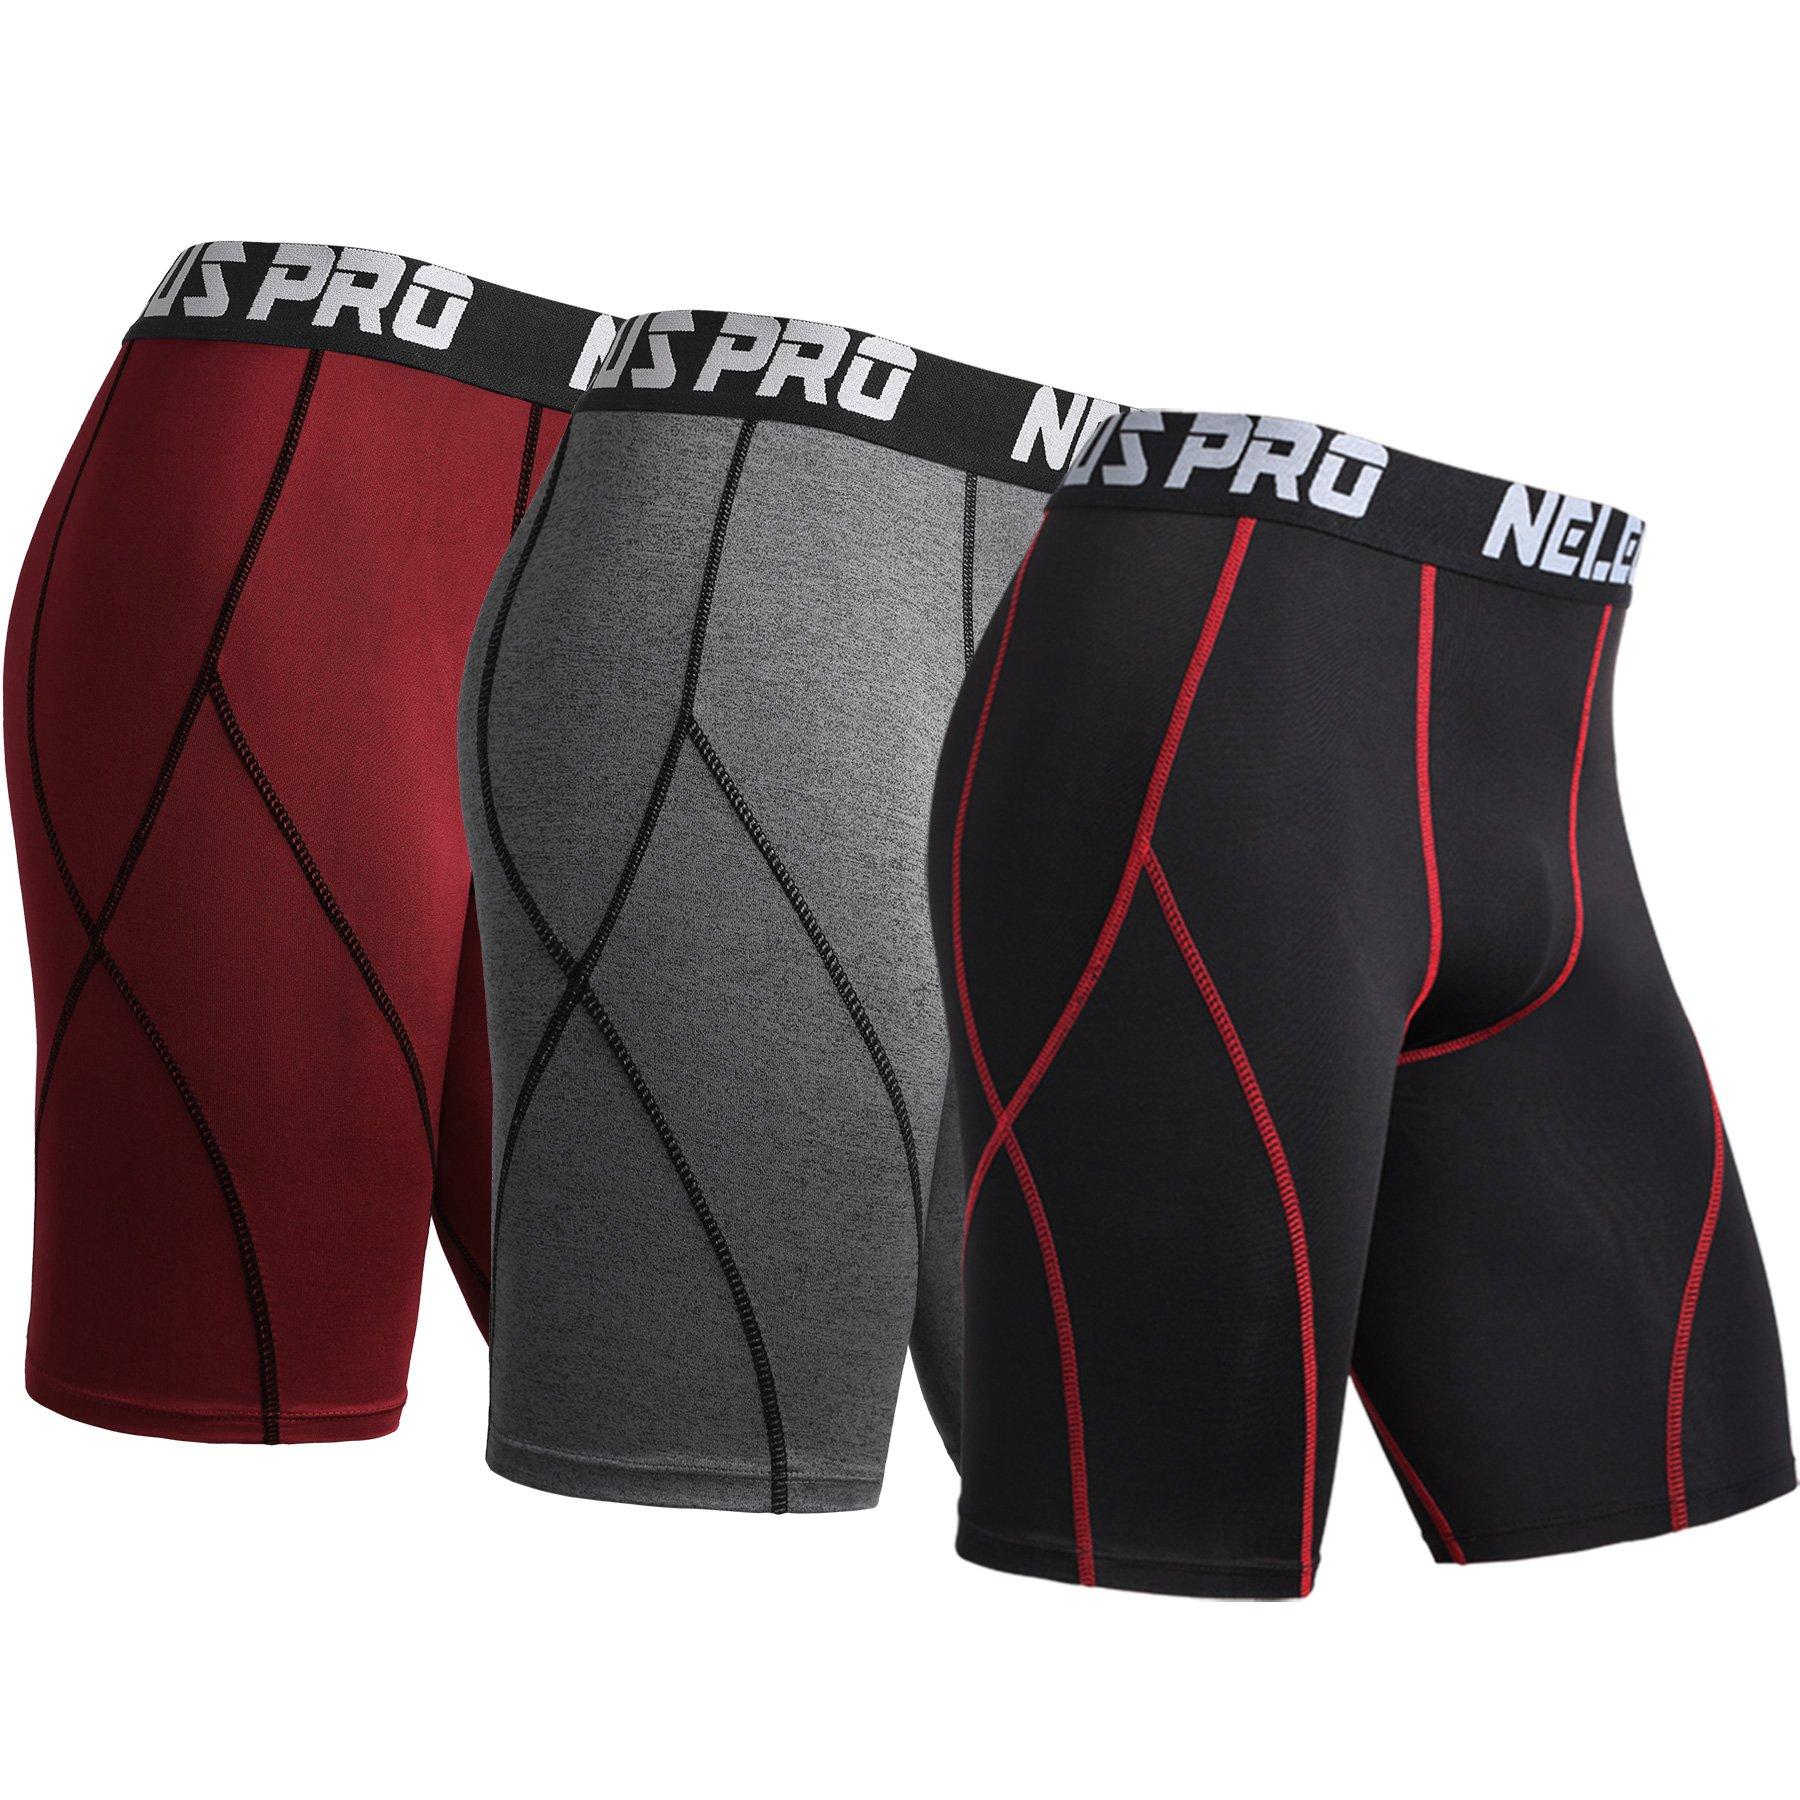 Neleus Men's 3 Pack Sport Running Compression Shorts,6012,Black (Red Stripe),Grey,Red,US L,EU XL